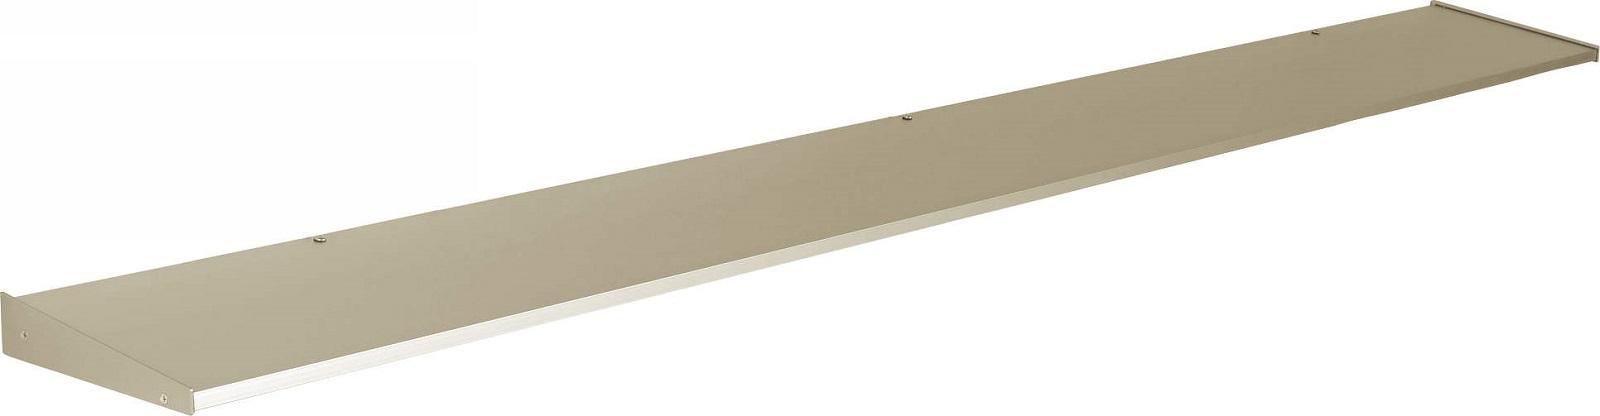 YKKAP窓まわり ひさし コンバイザー モダンスタイル 出幅200mm:先付・後付兼用[幅3630mm×高35mm]